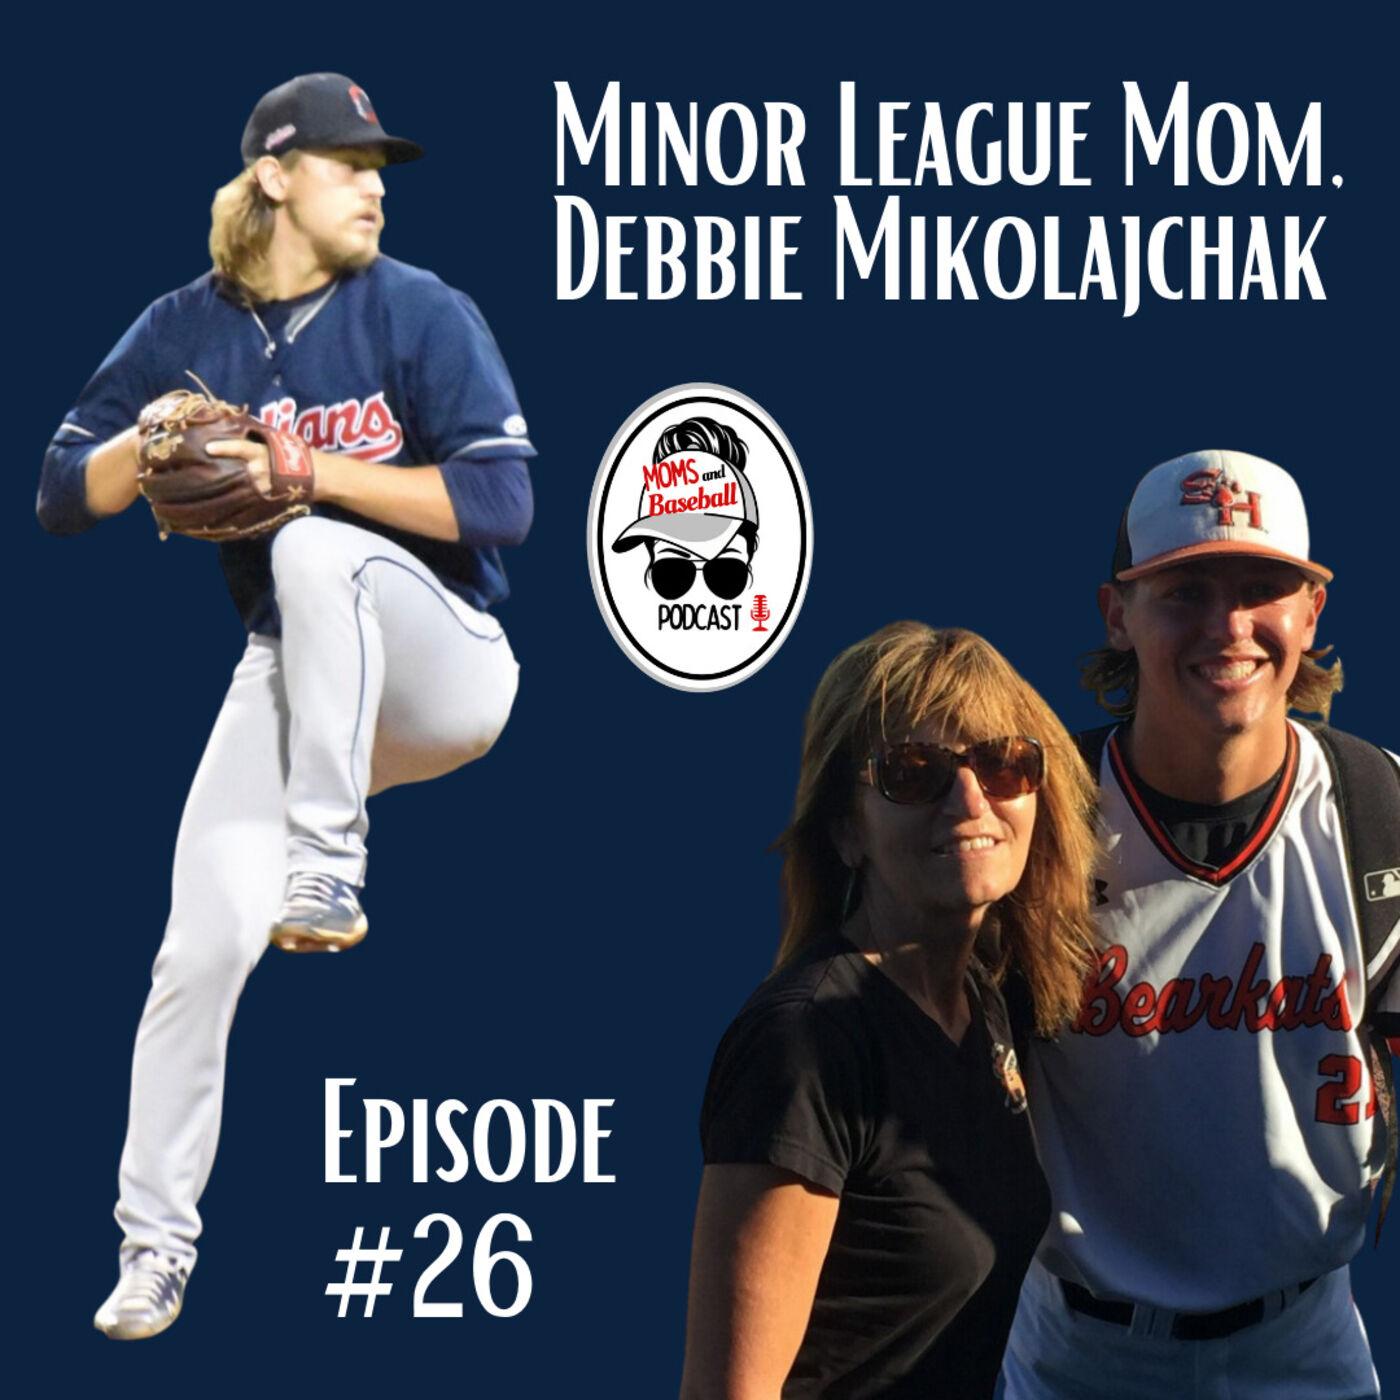 026: Interview with Minor League Mom, Debbie Mikolajchak